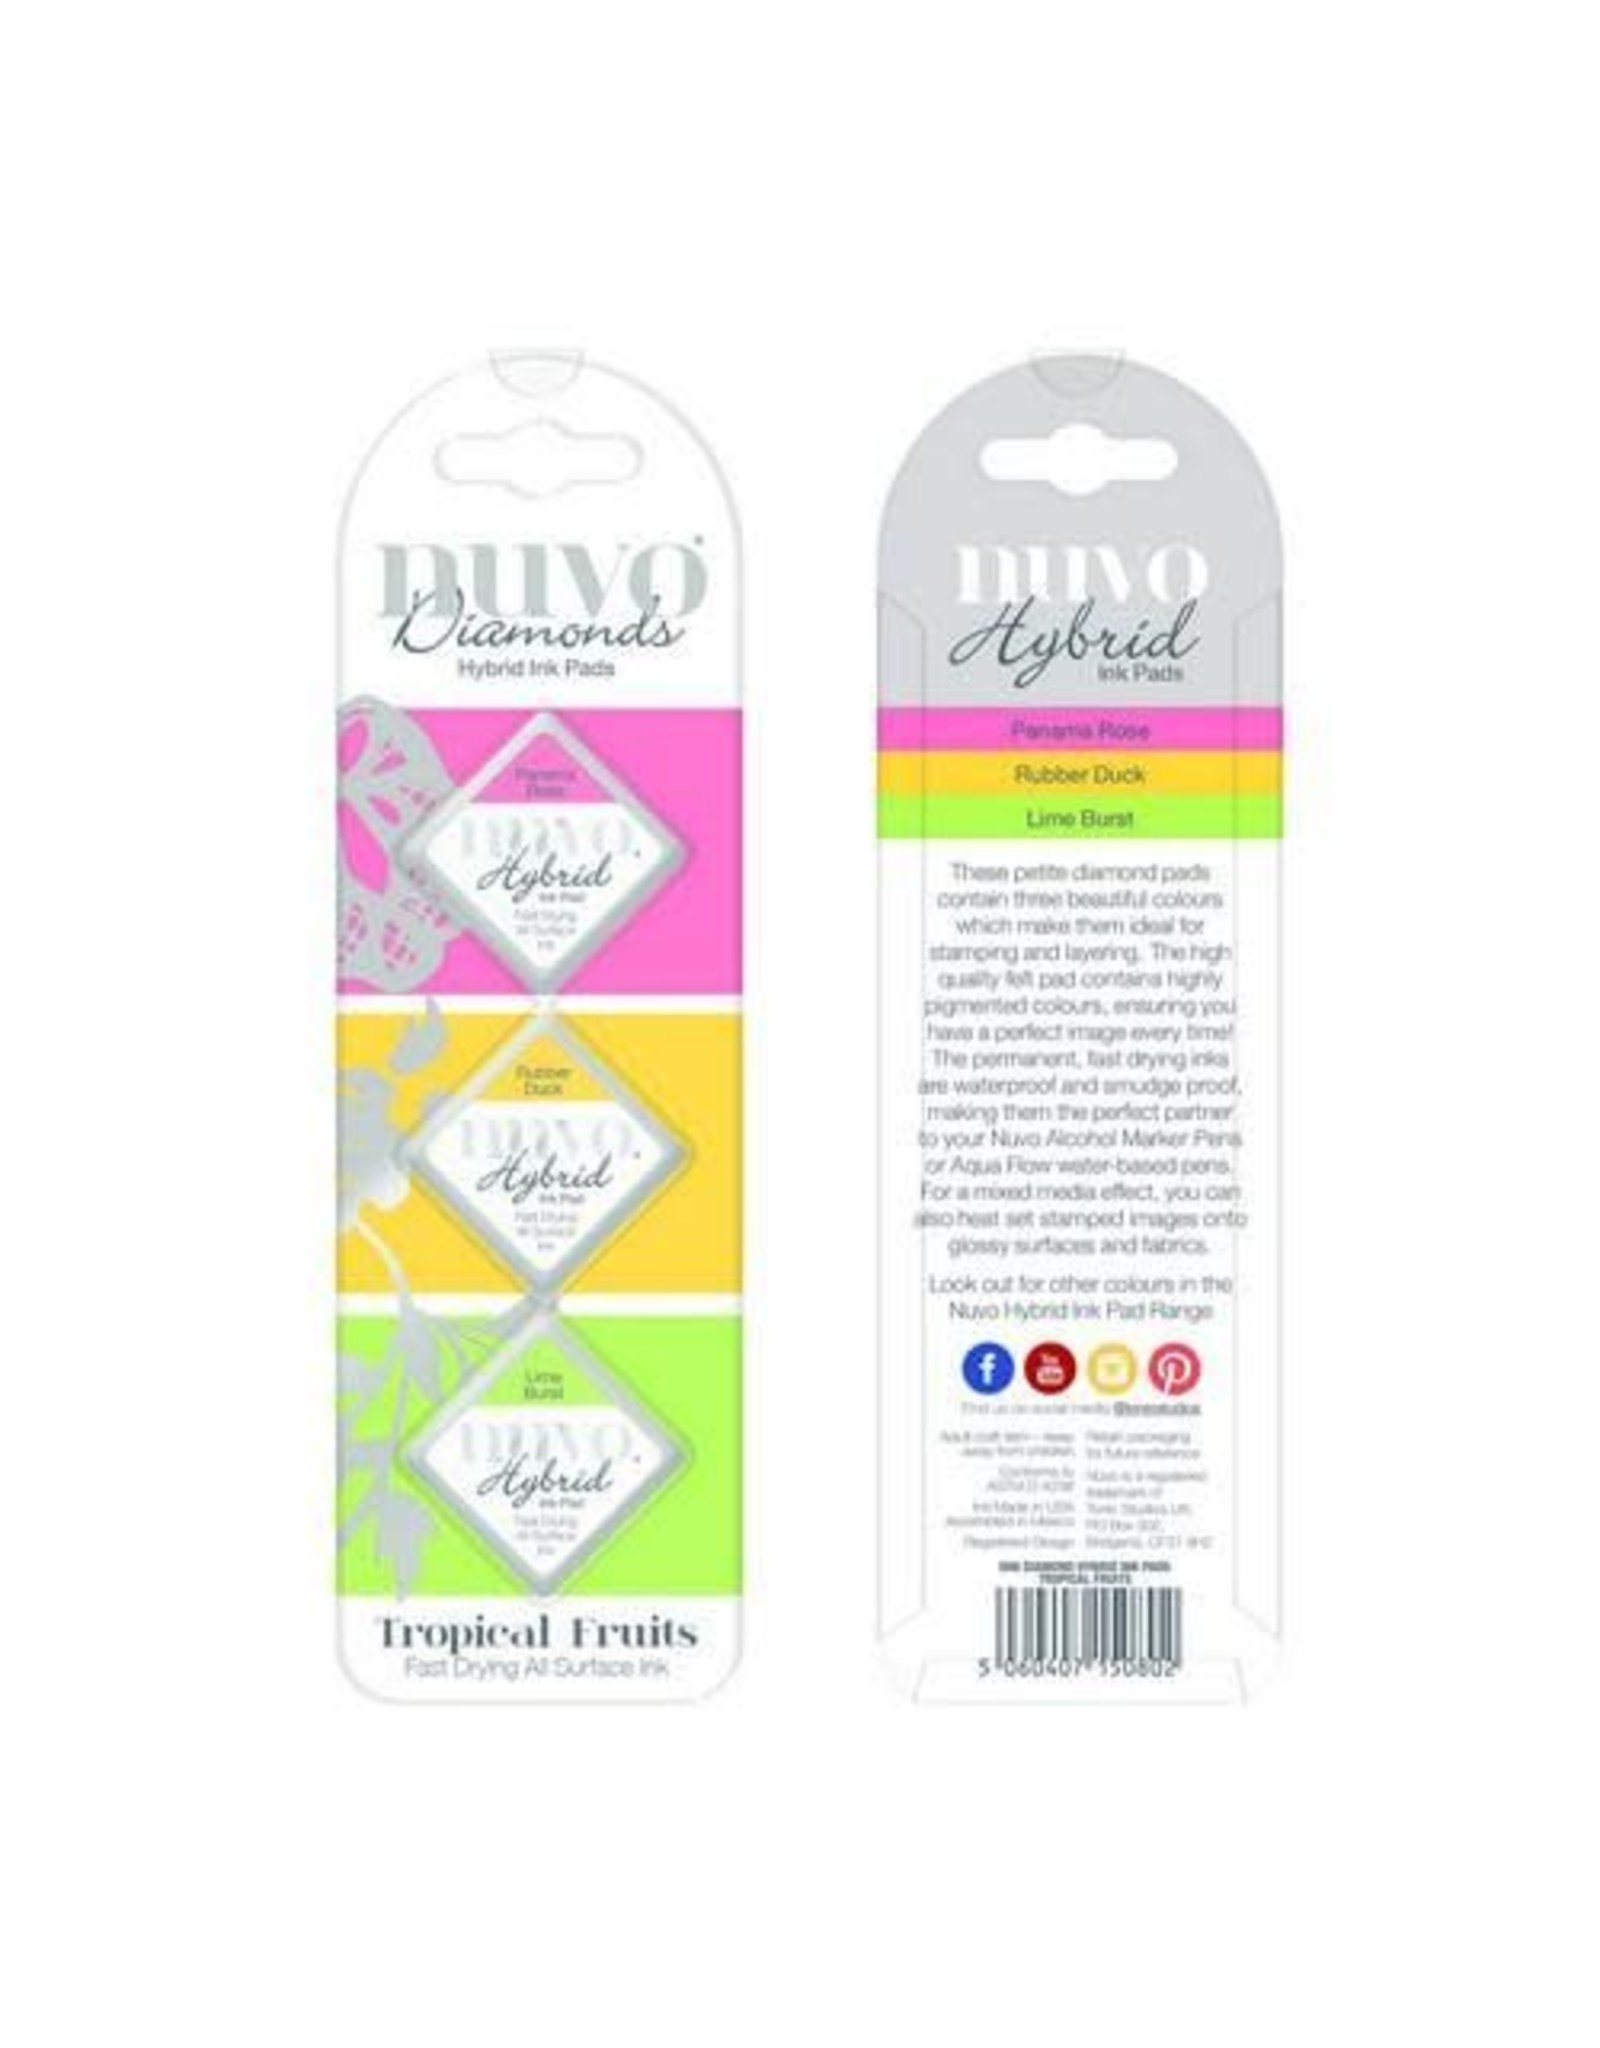 Nuvo ink pads Nuvo Diamond hybrid ink pads - tropical fruits 80N